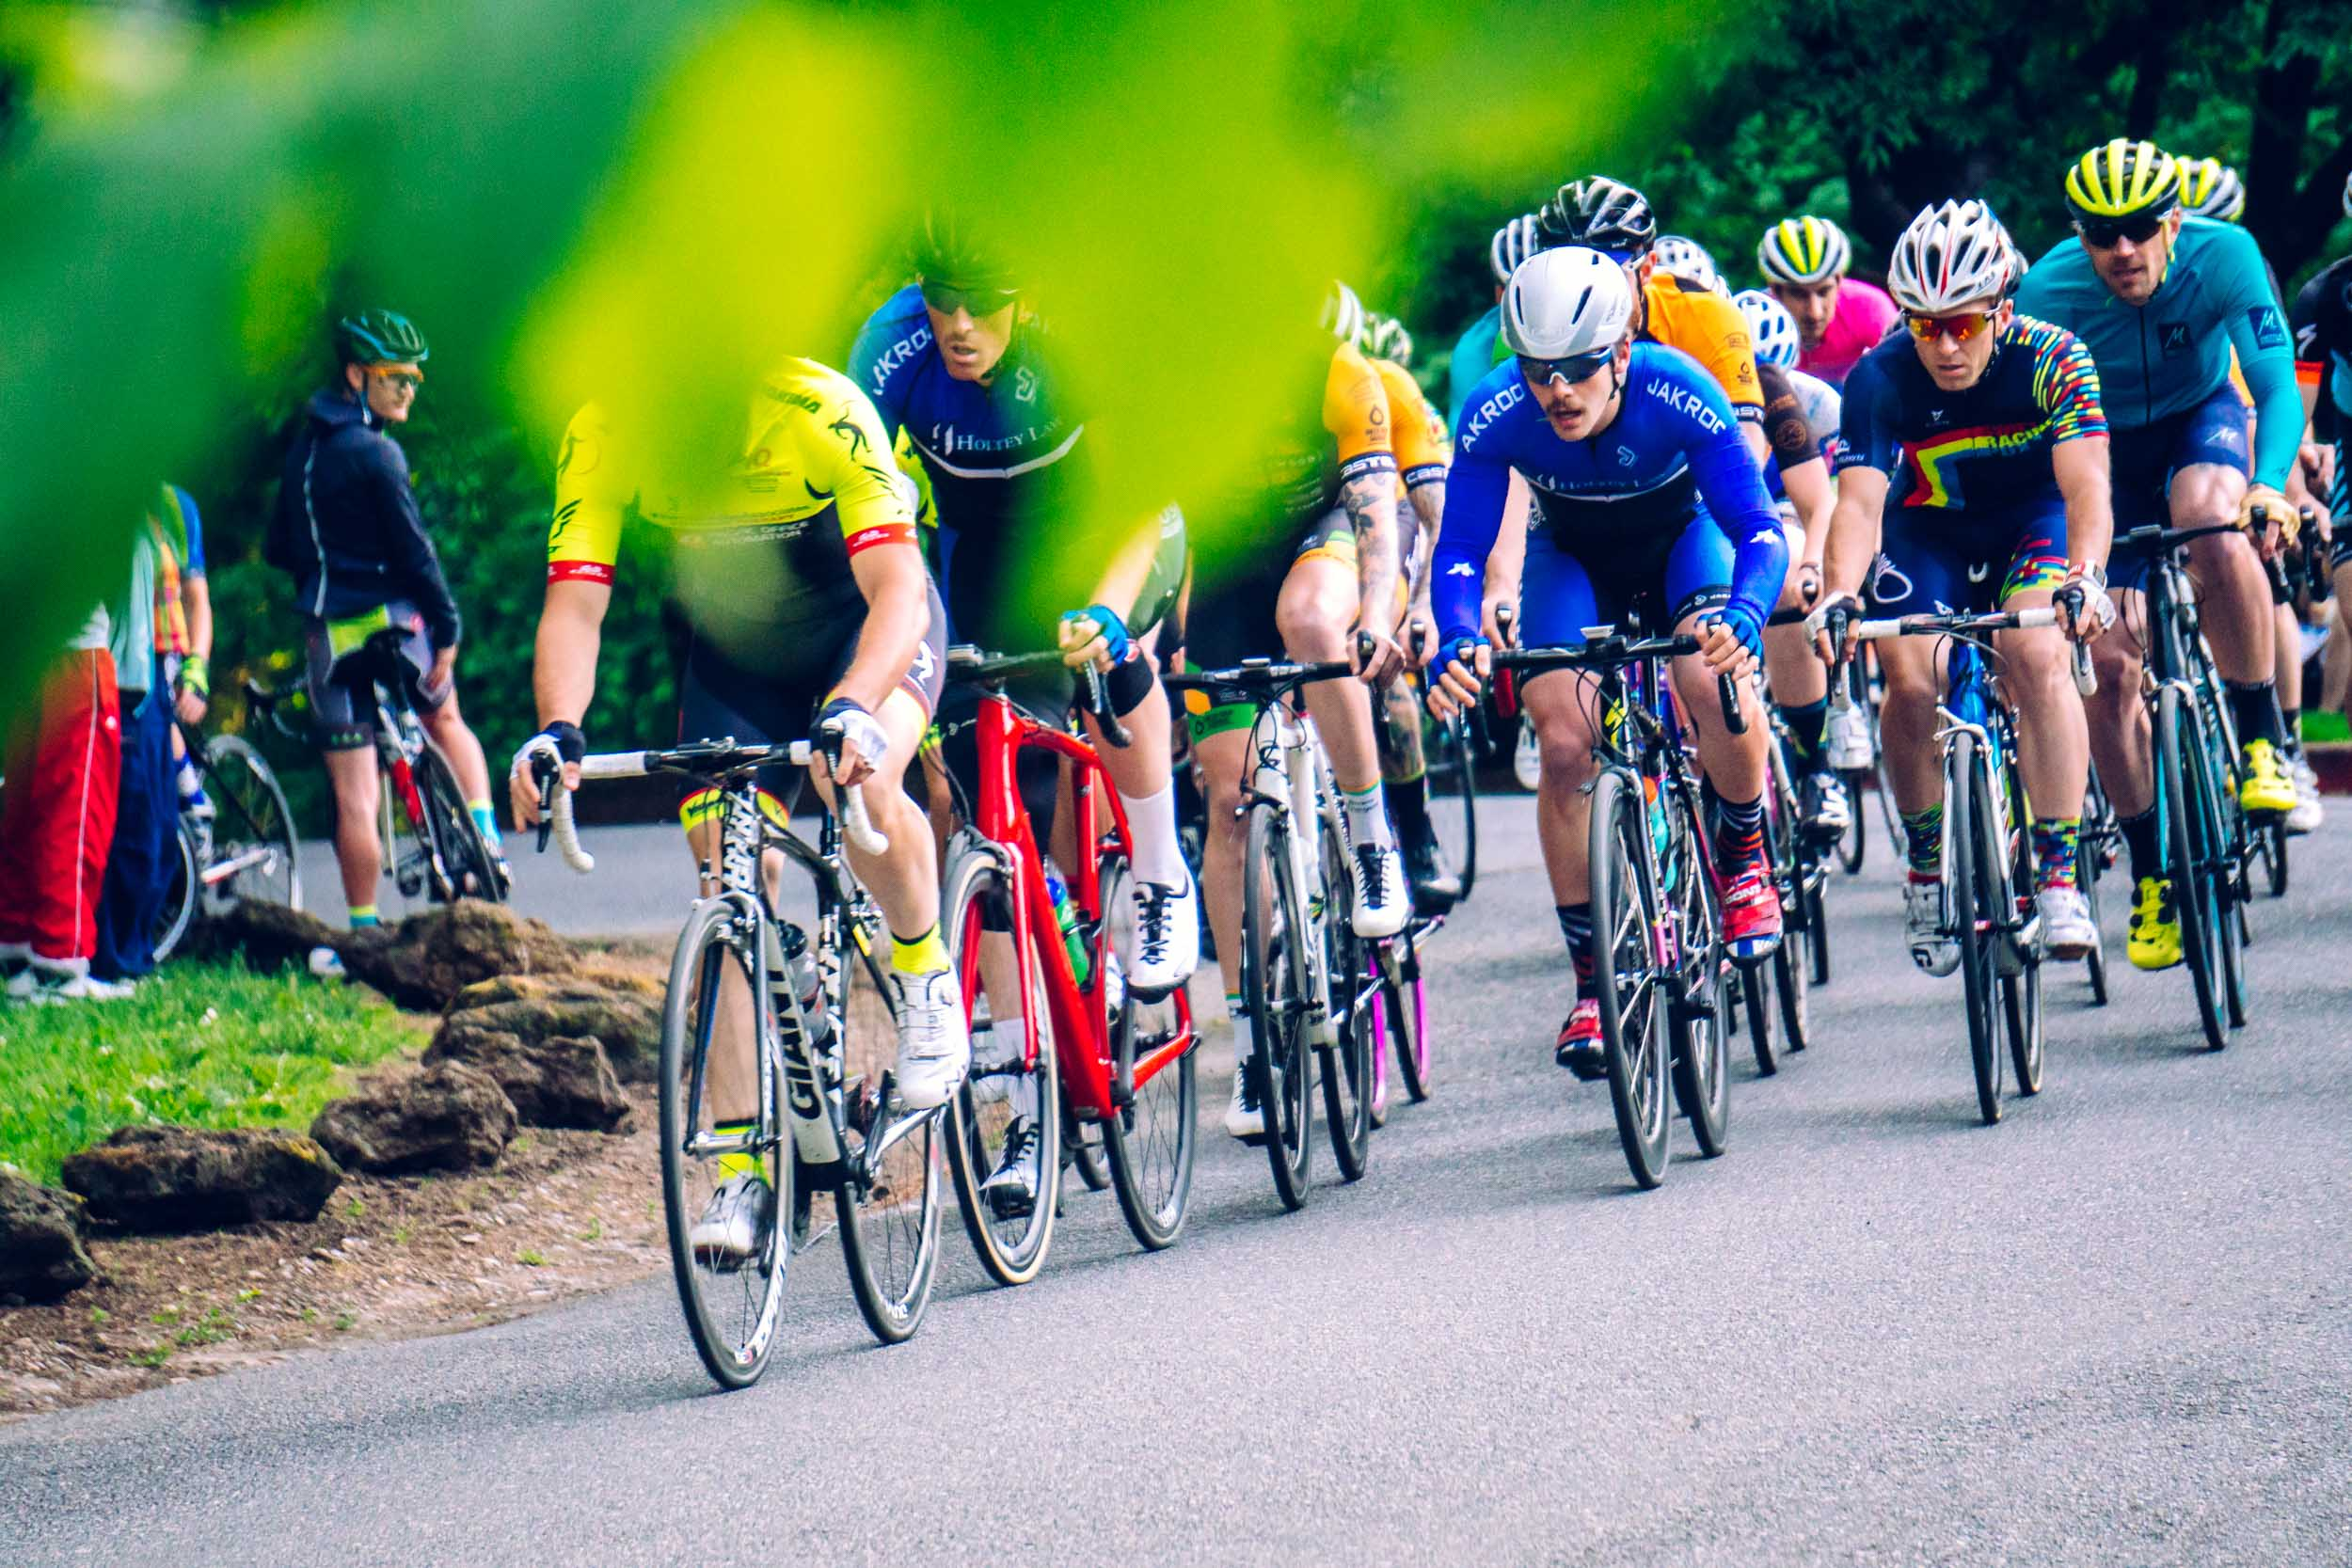 tabor_road_race_2_22.jpg